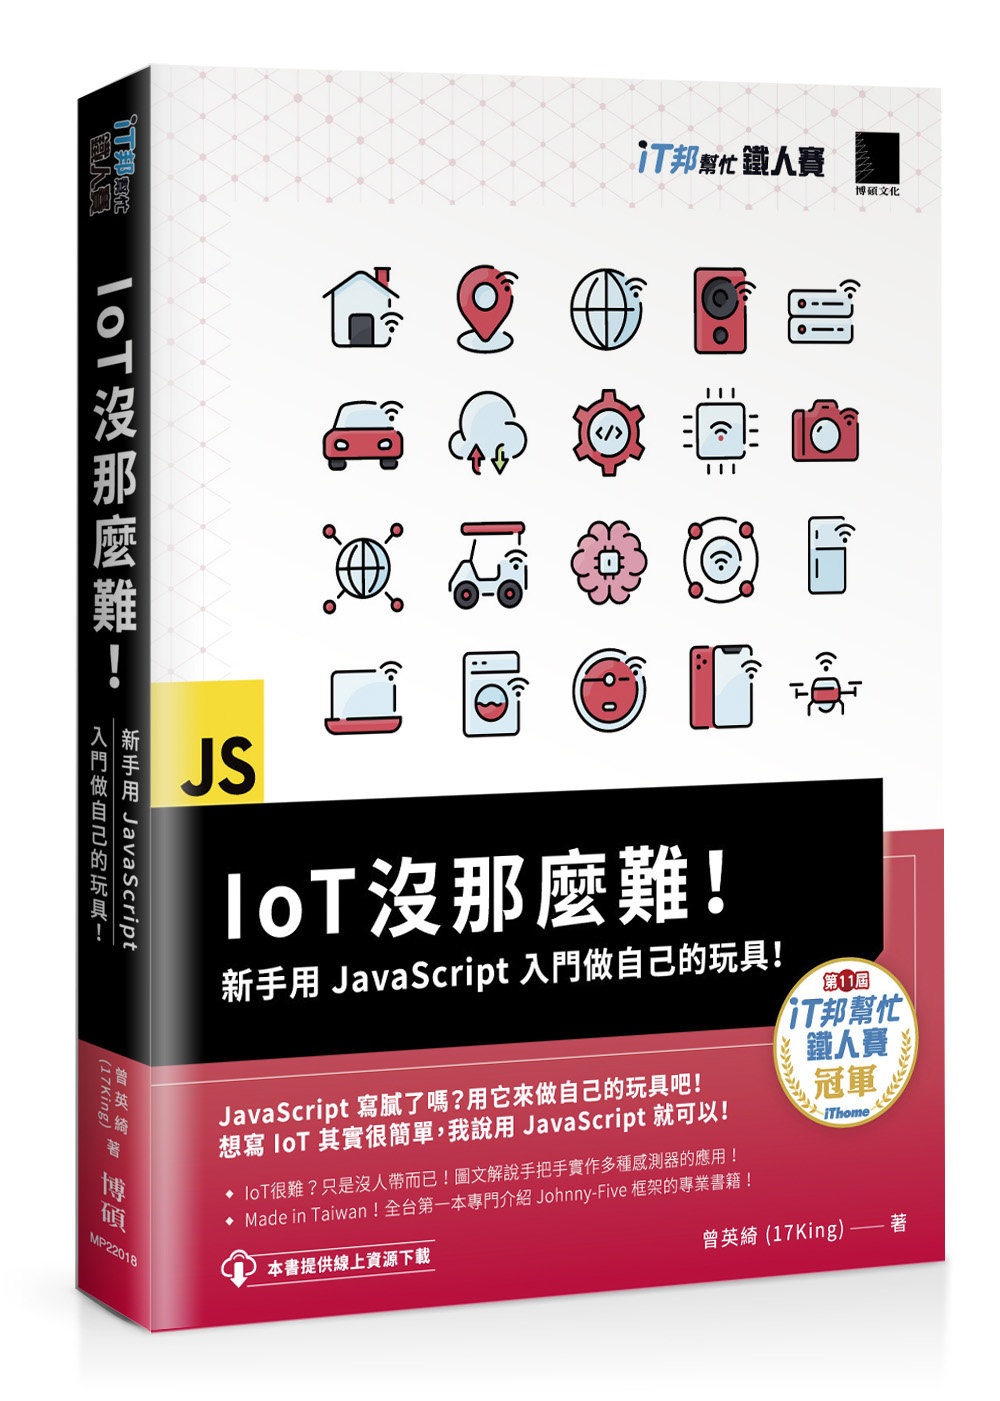 IoT 沒那麼難!新手用 JavaScript 入門做自己的玩具!(iT邦幫忙鐵人賽系列書)-preview-1